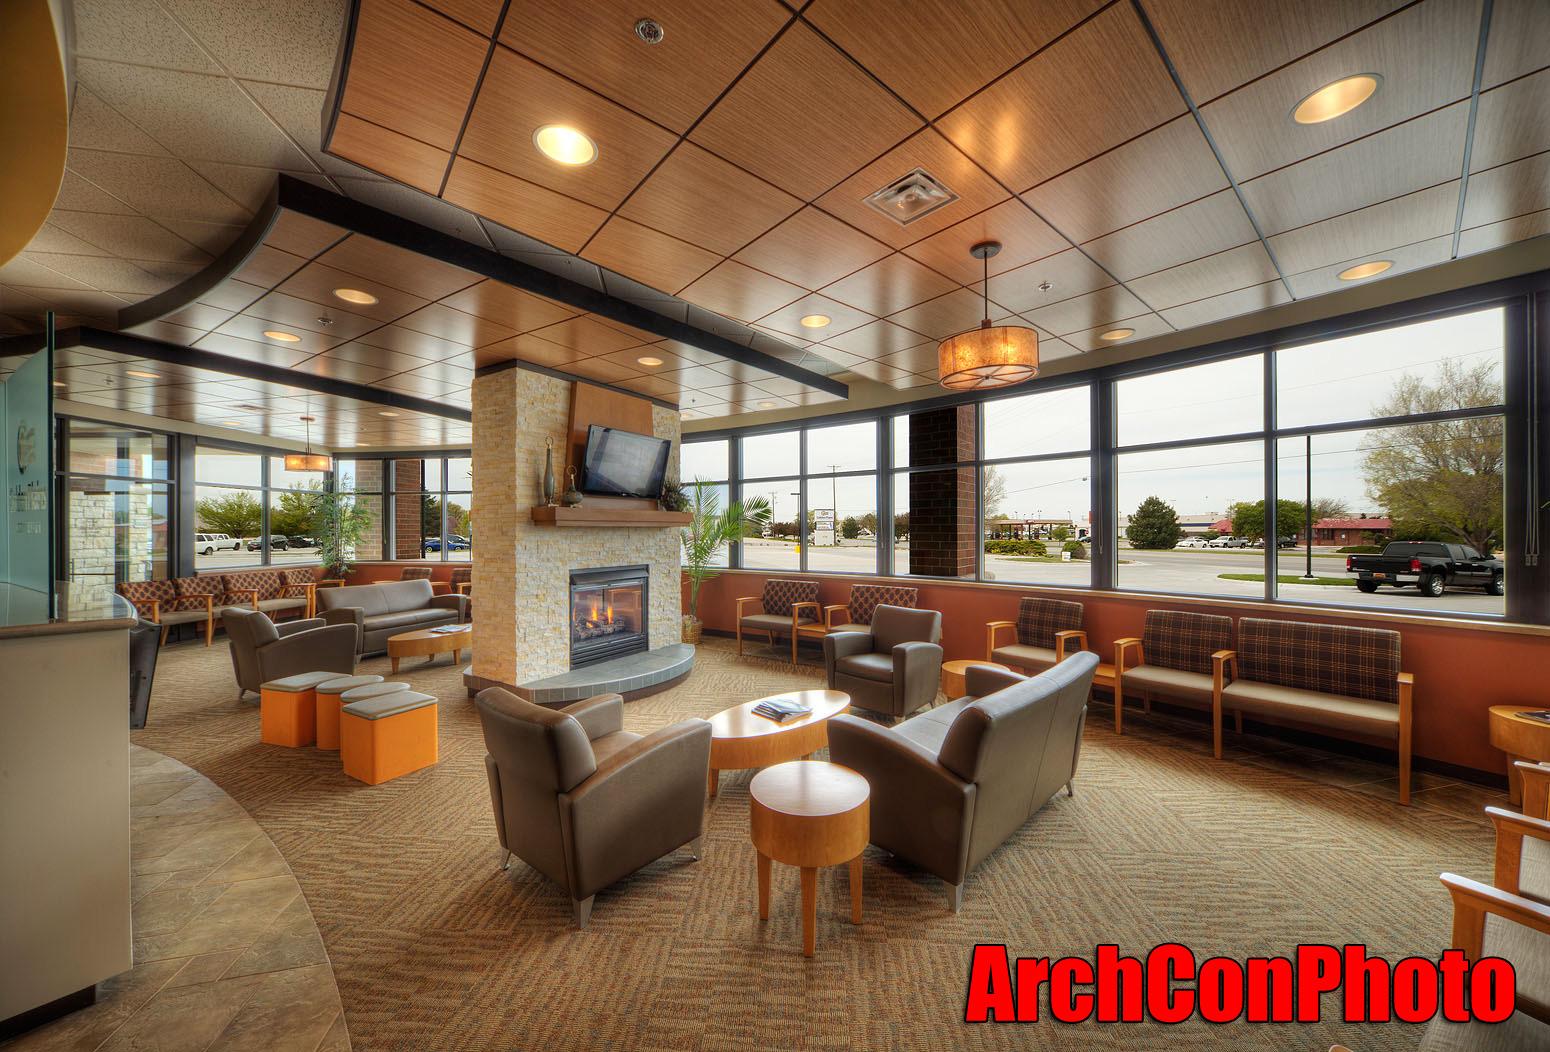 Architectural Photography Archconphoto Architectural Photography Golden Plains Credit Union